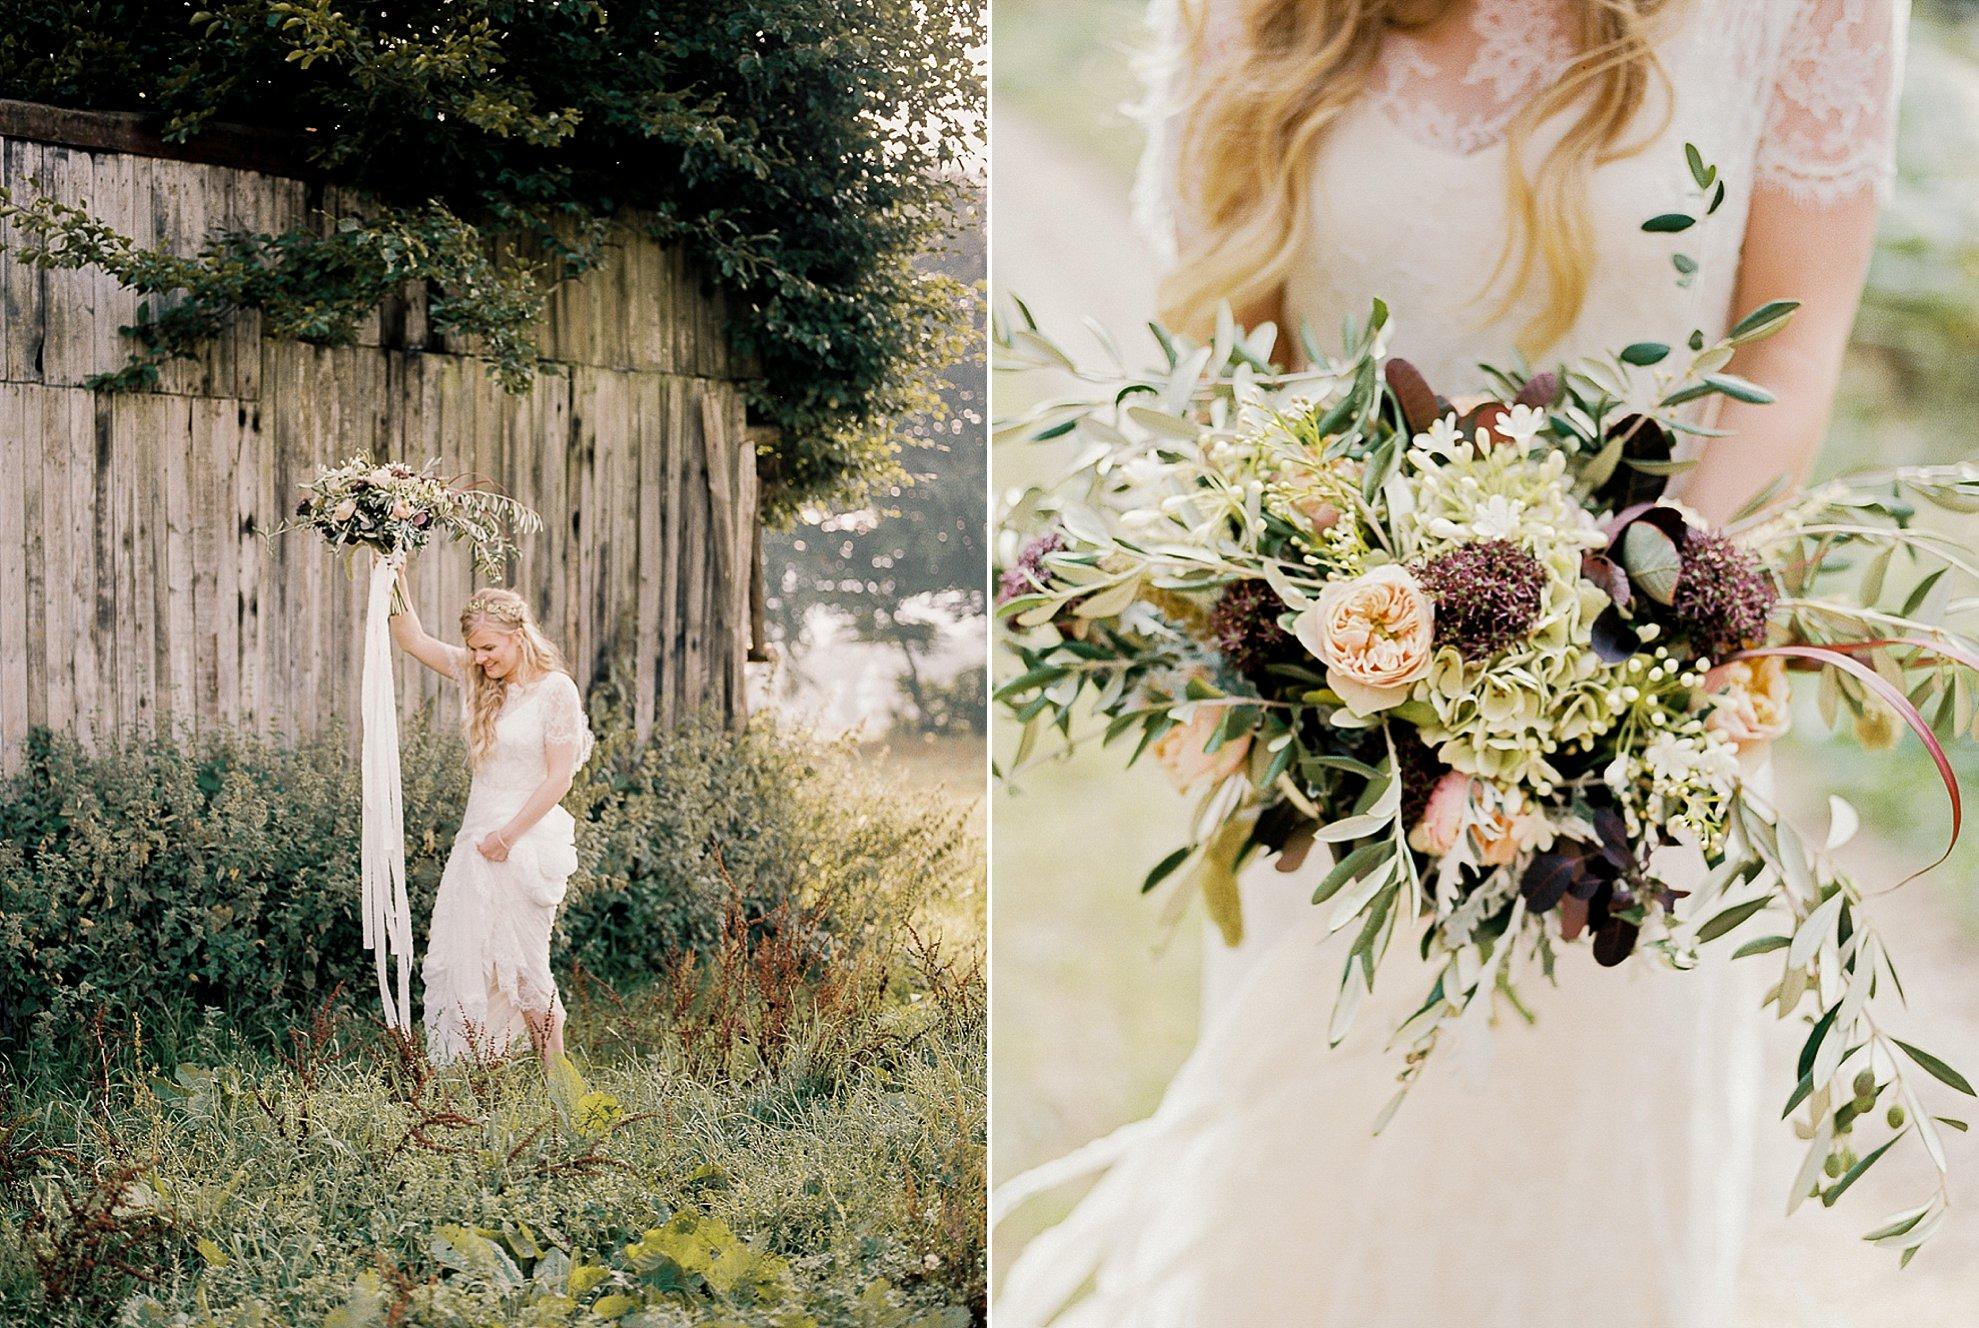 Amanda-Drost-Fotografie-Belgie-Photography-Wedding_0033.jpg